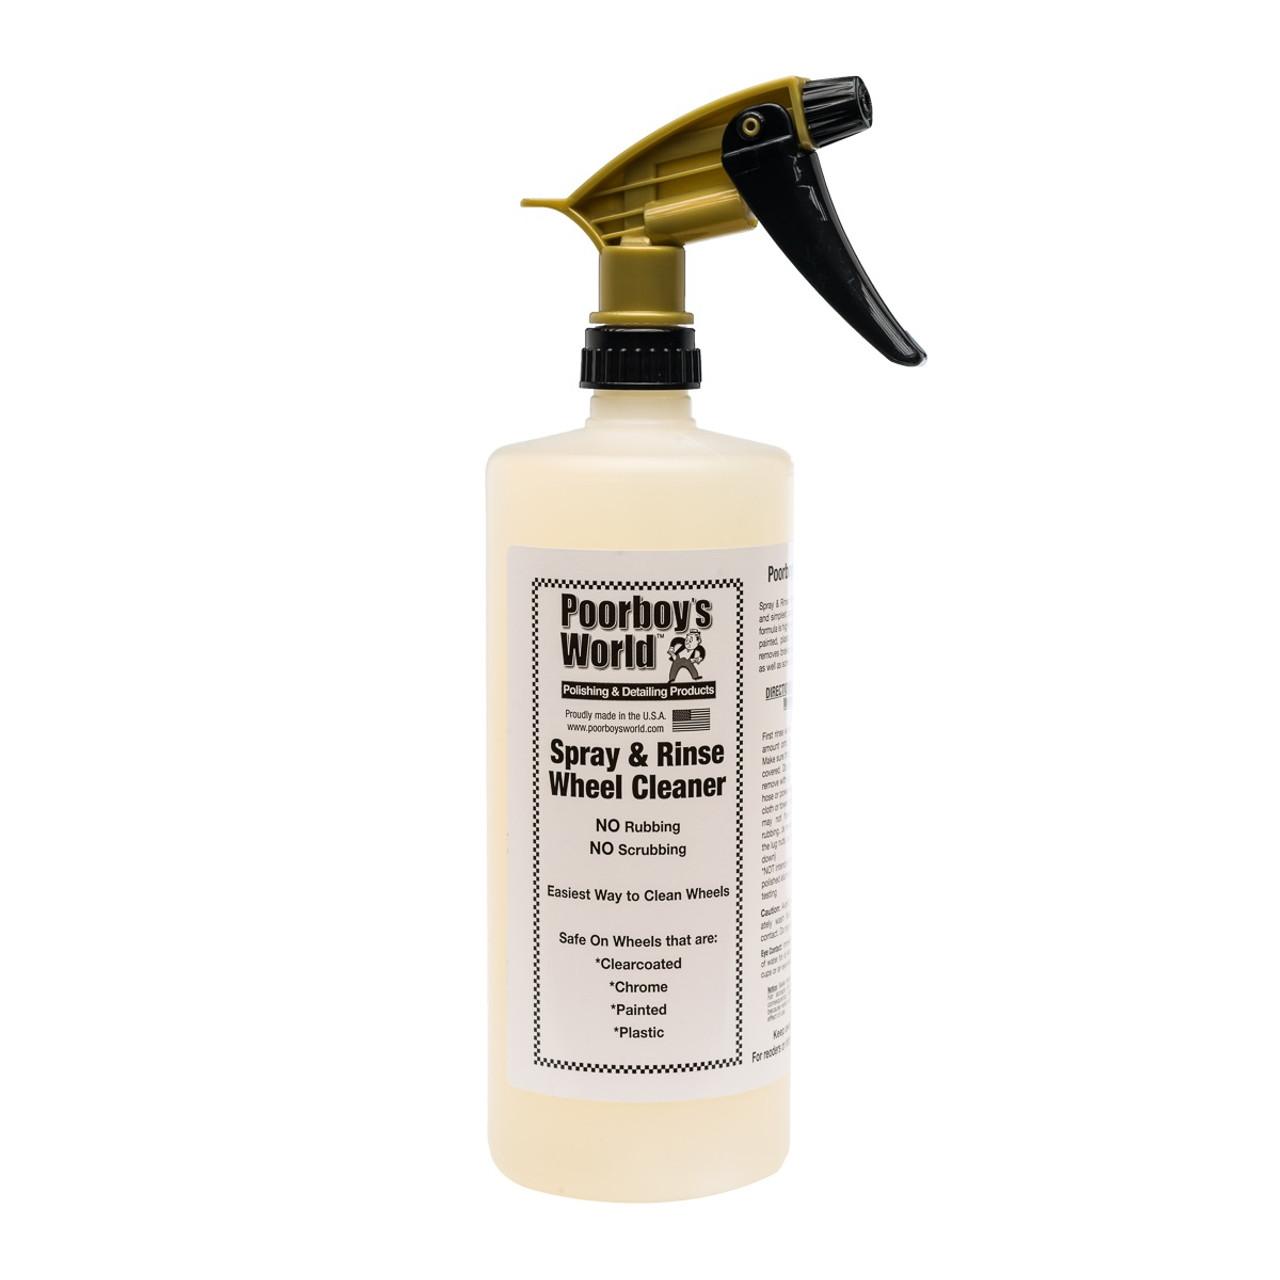 Spray & Rinse Wheel Cleaner 32oz